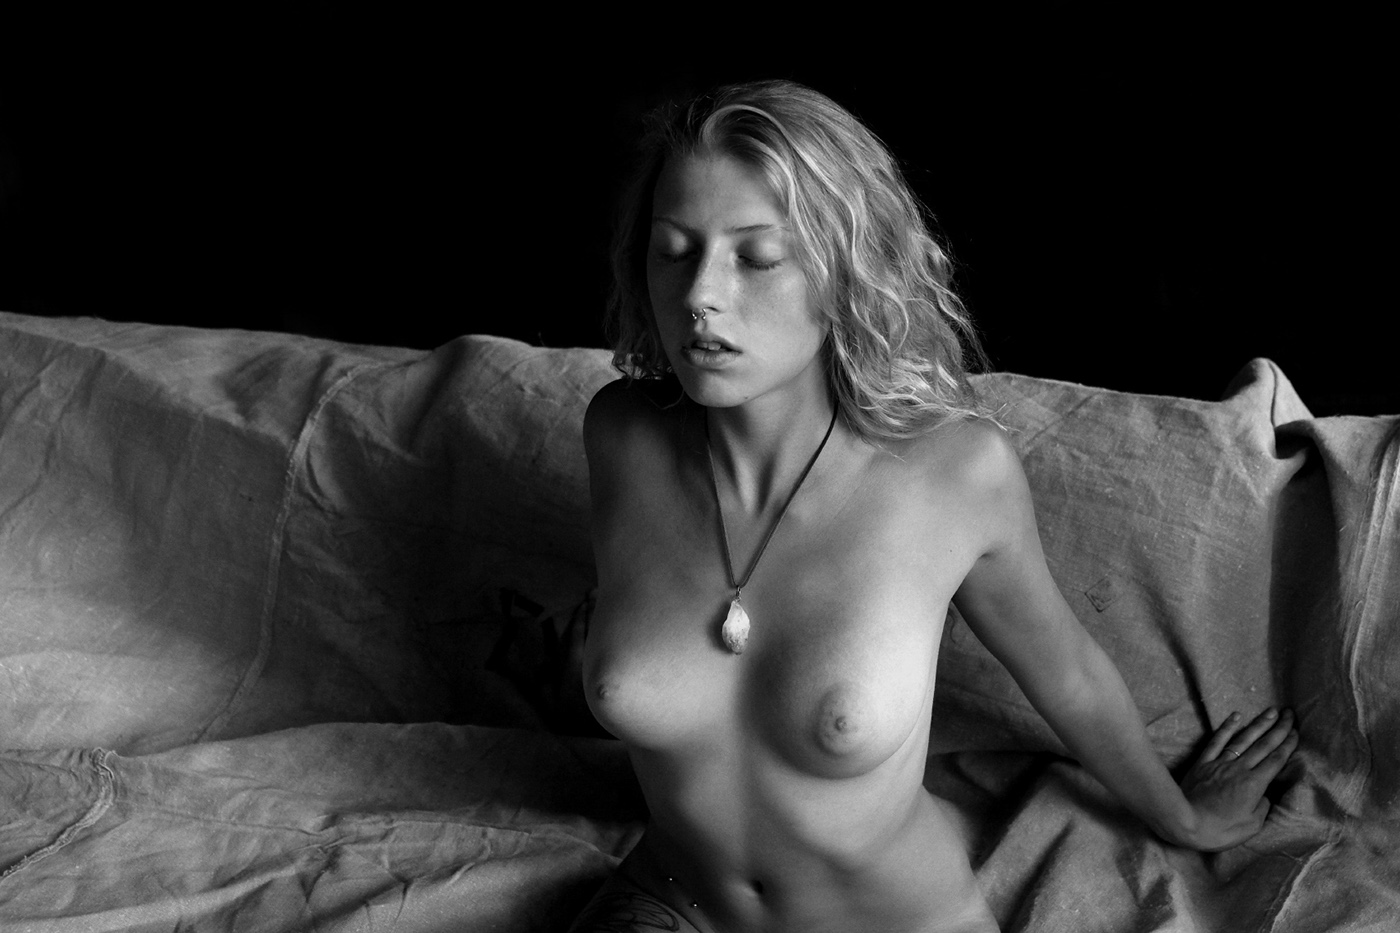 Nastasia для издания P-Magazine / фото Adolfo Valente